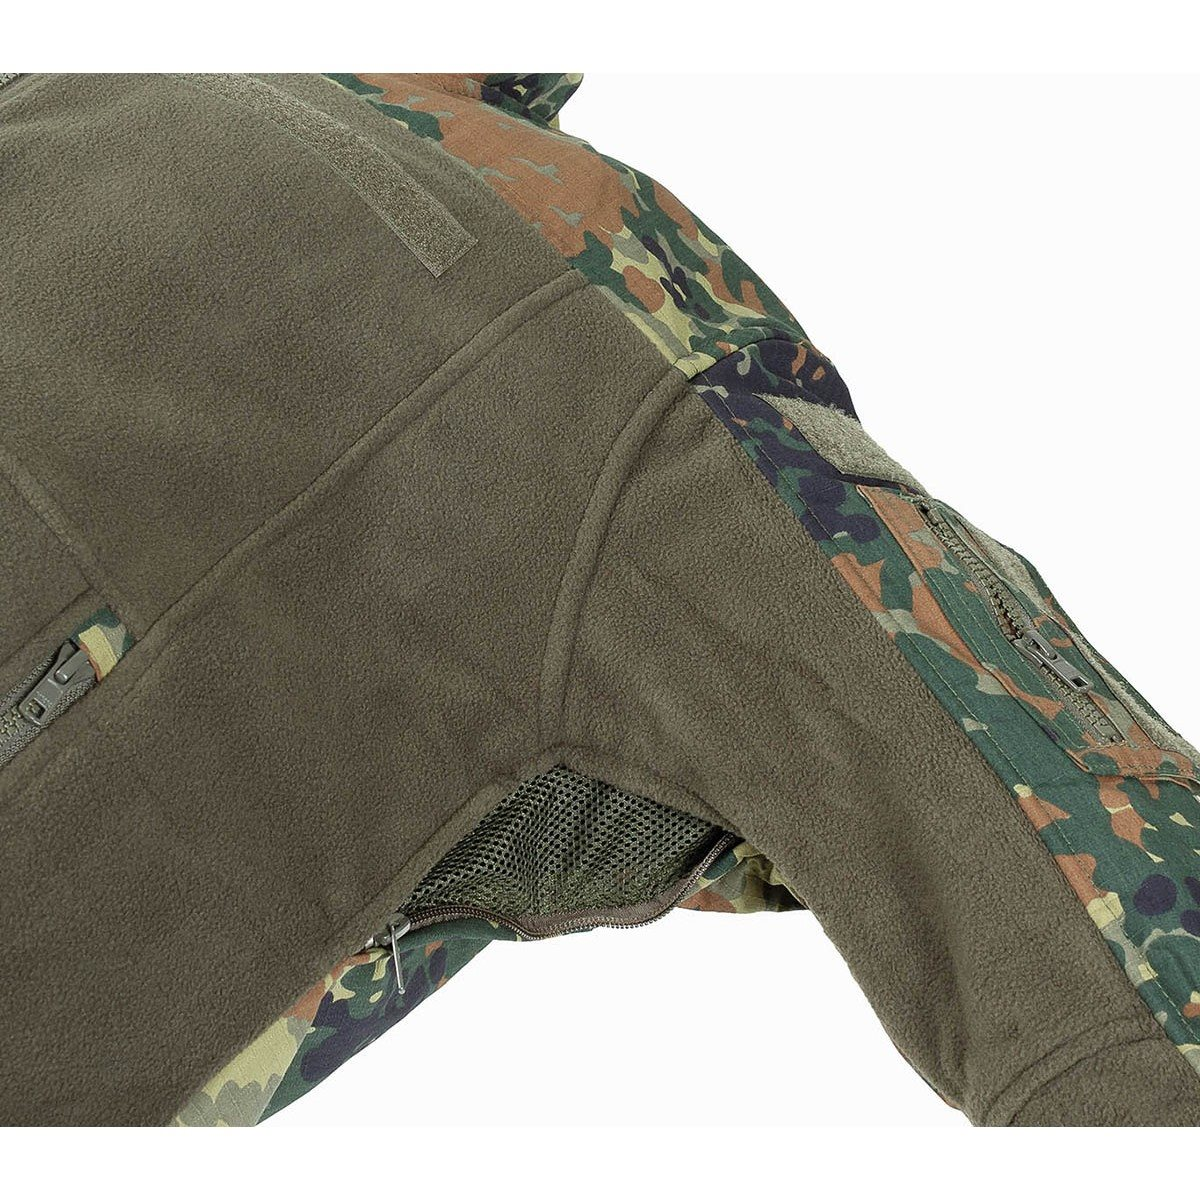 Tactical fleece jacket COMBAT FLECKTARN MFH Defence 03811V L-11